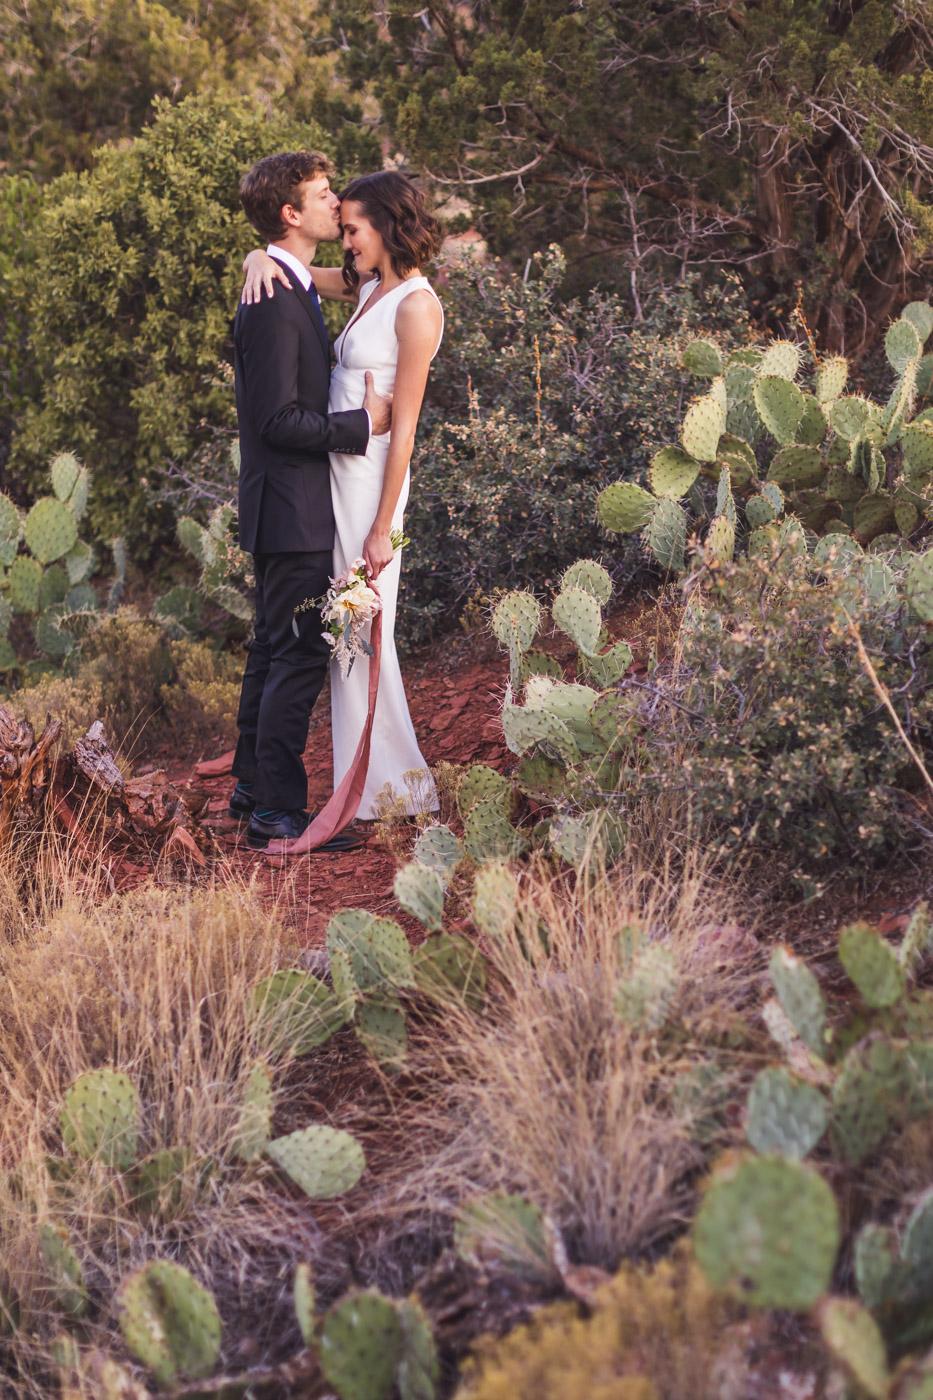 cactus-kiss